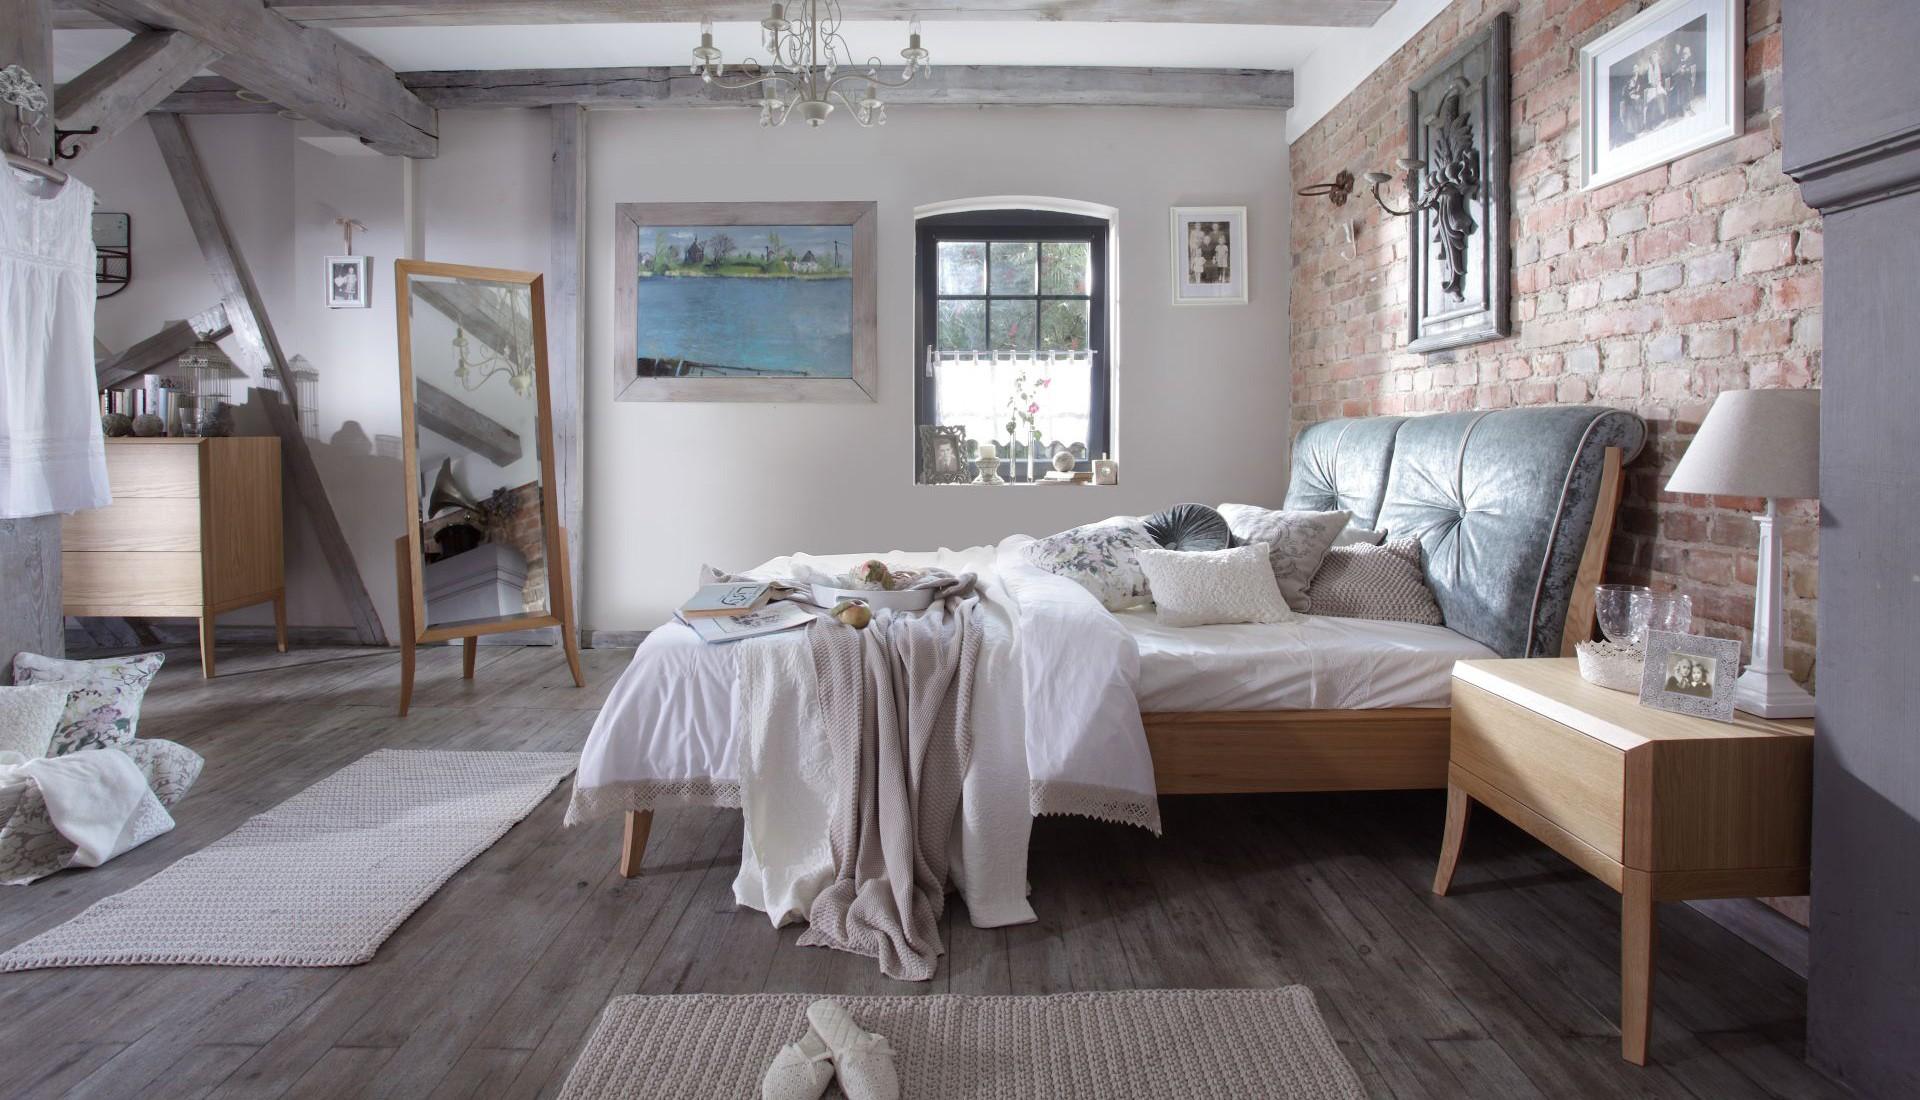 test1 Спальня Dream (Swarzedz Home, Польша) Фото 13